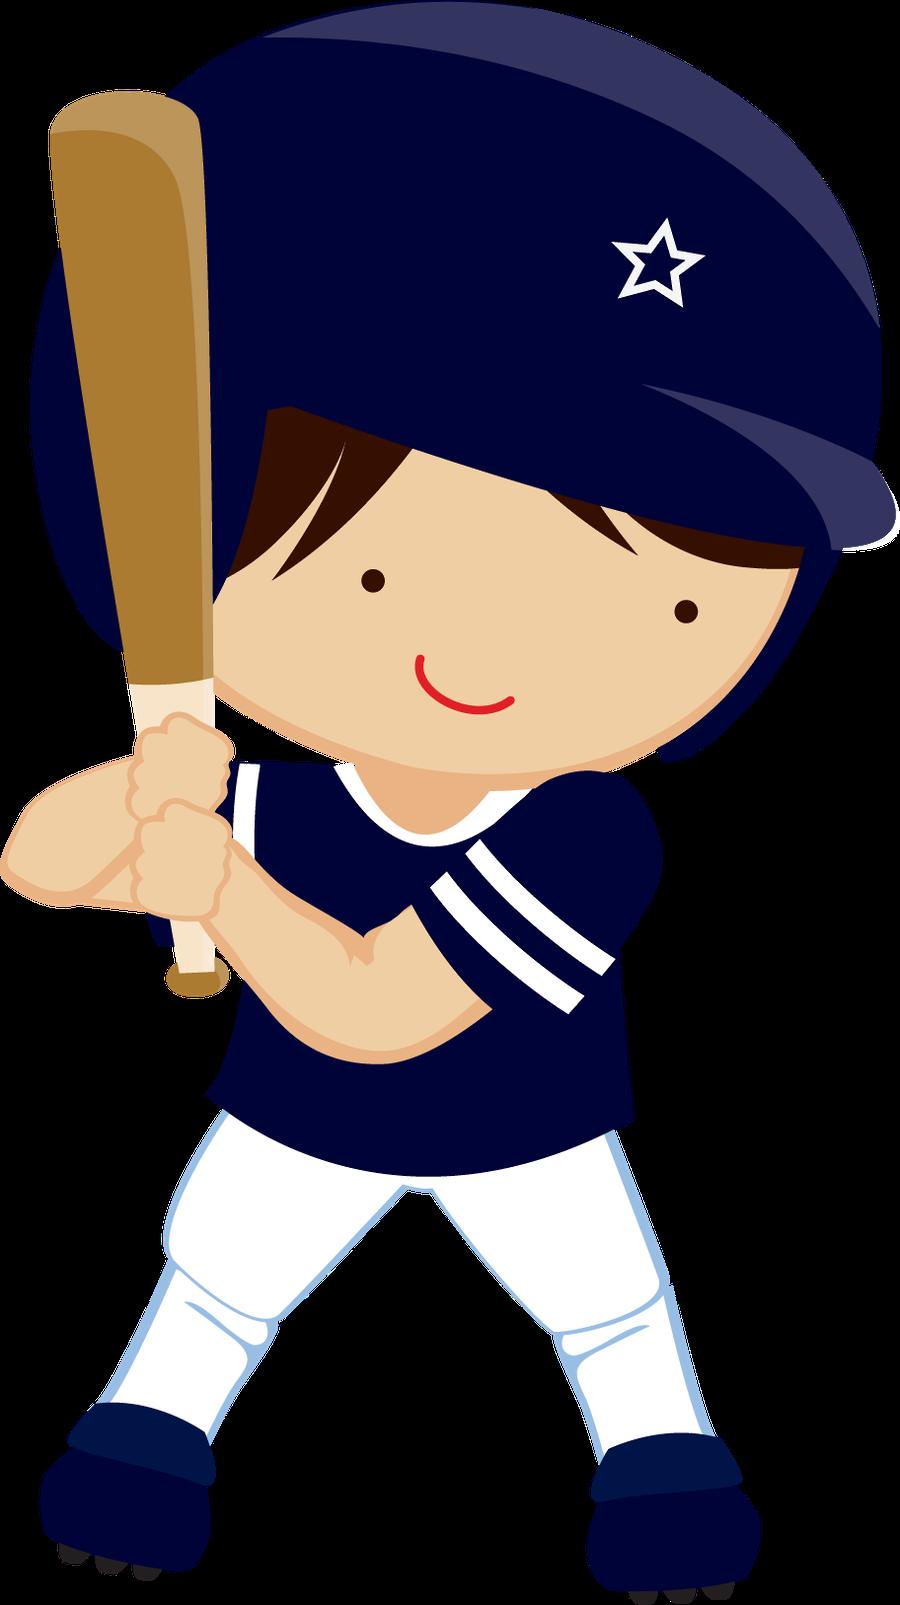 Zwd whitestar minus alreadyclipart. Scrapbook clipart baseball